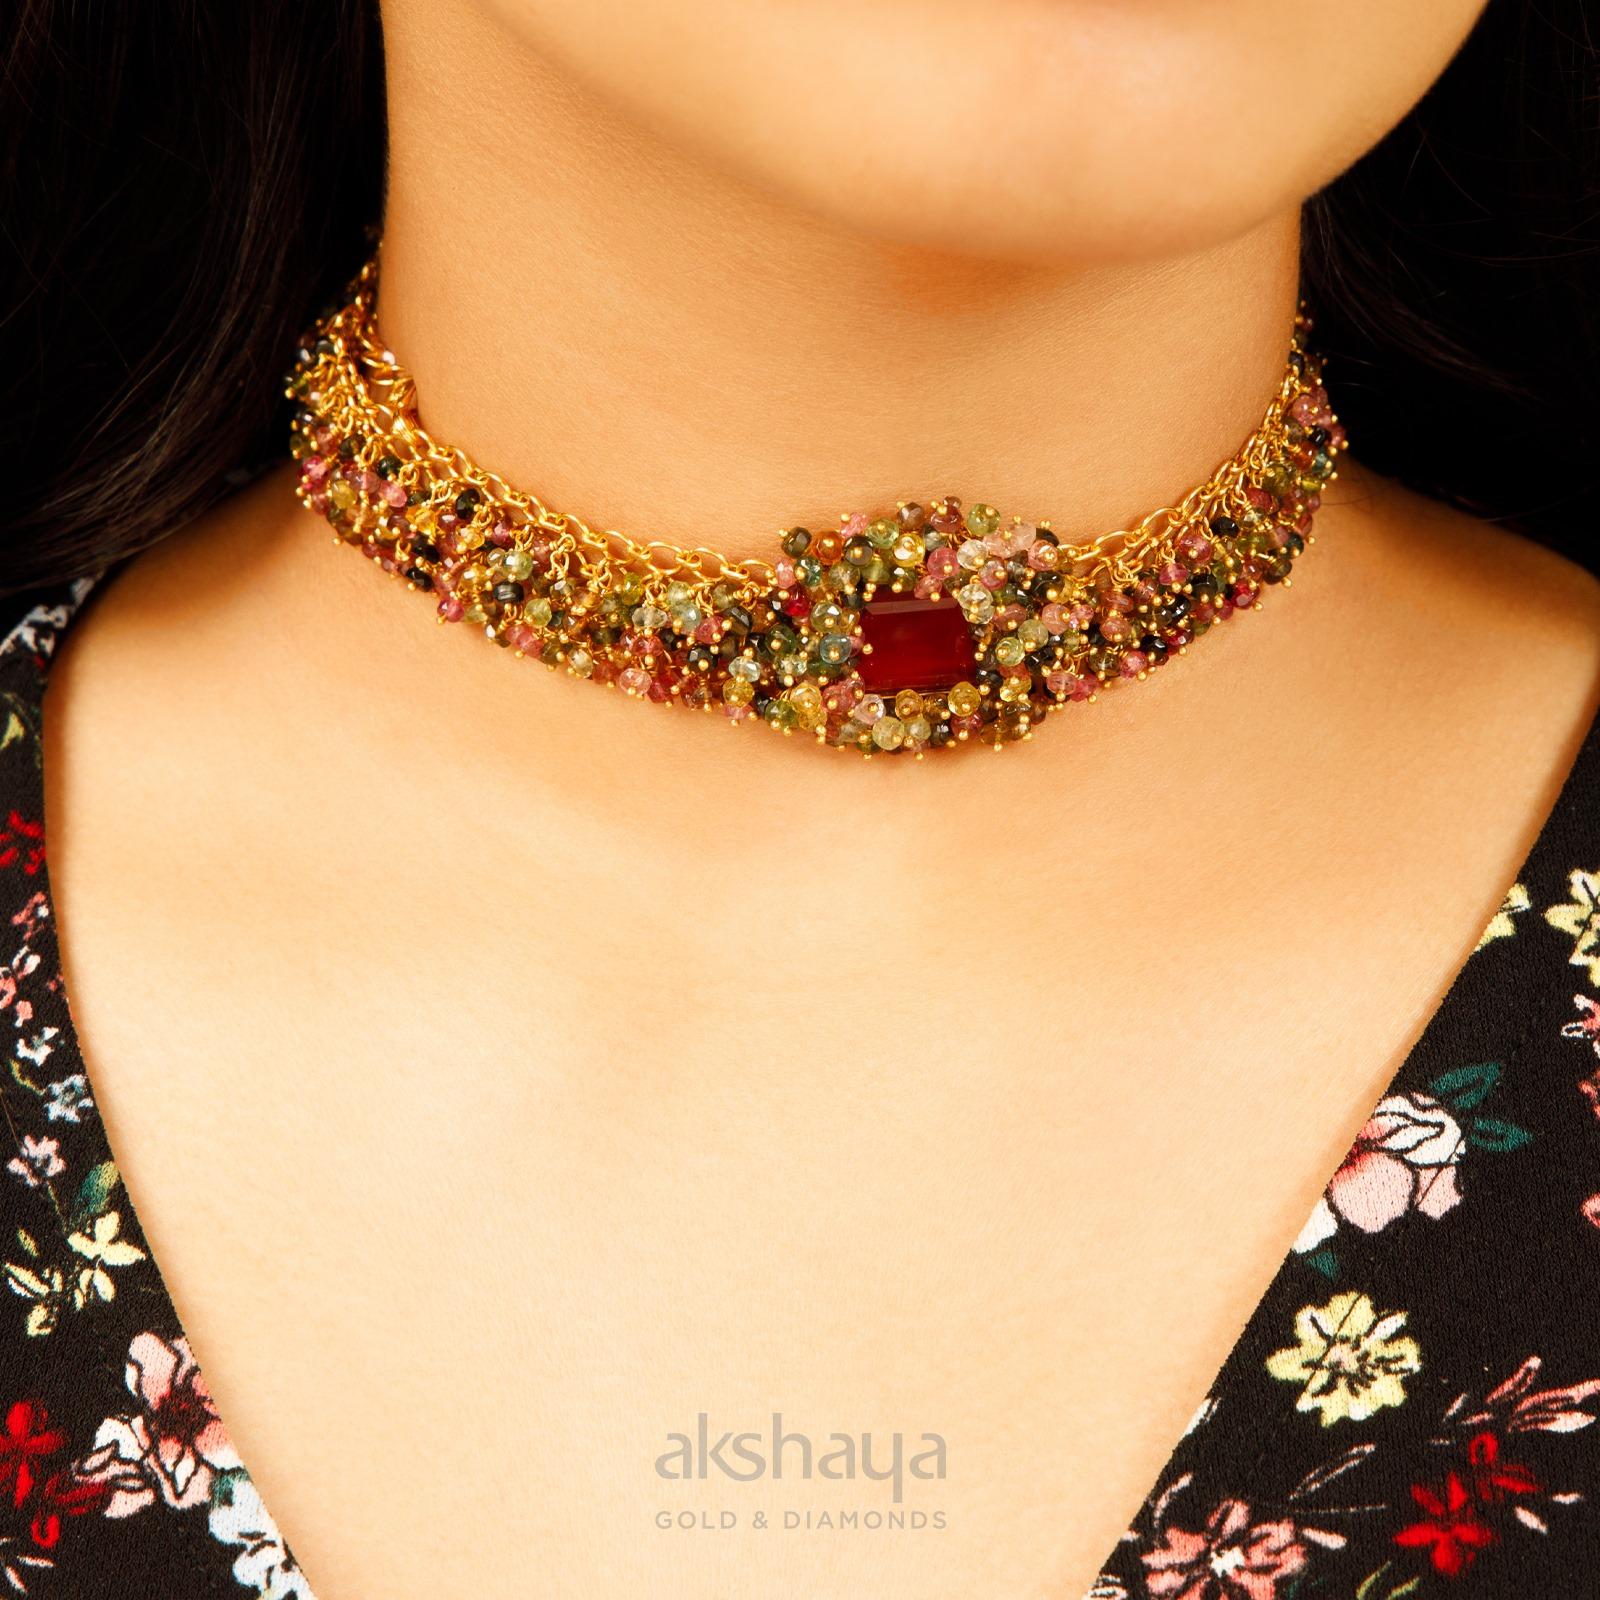 Akshaya Gold Necklace GL10270